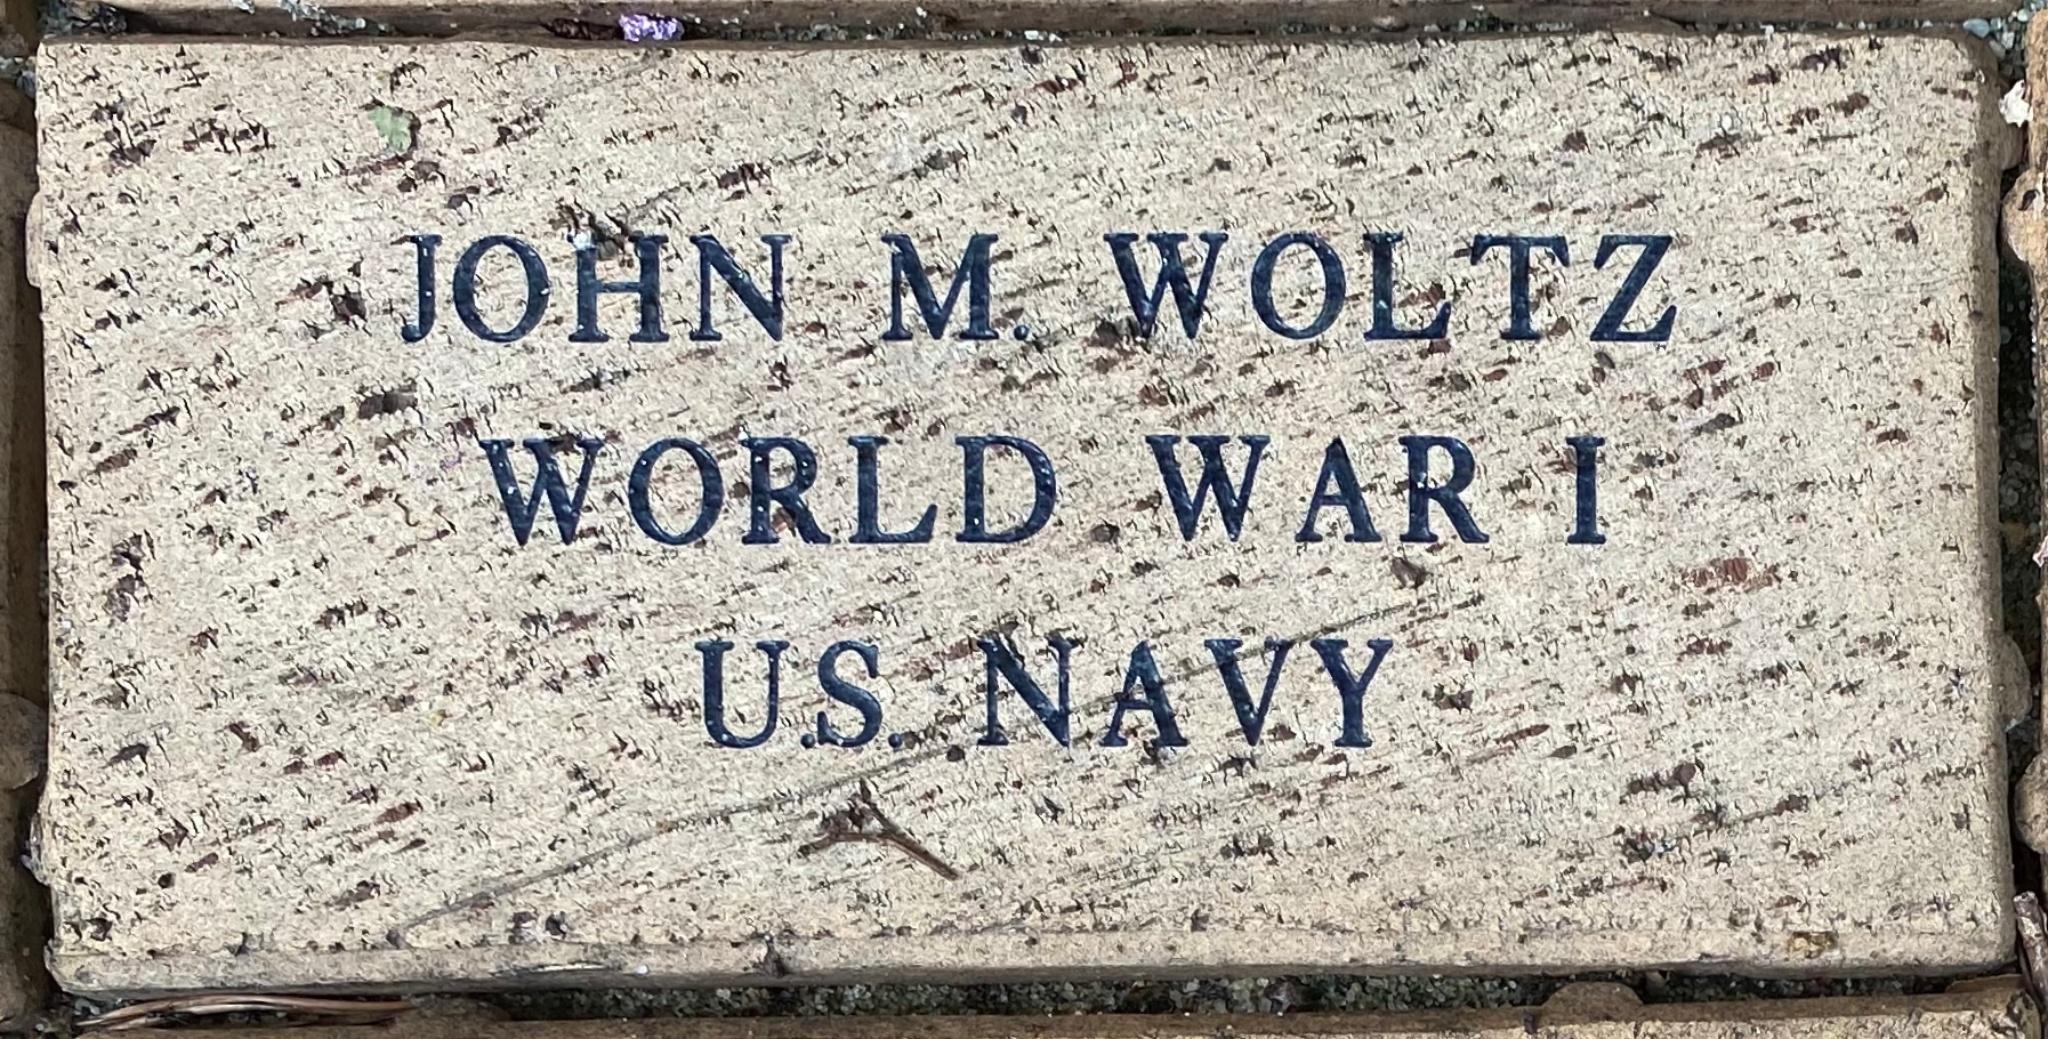 JOHN M. WOLTZ WORLD WAR I U.S. NAVY